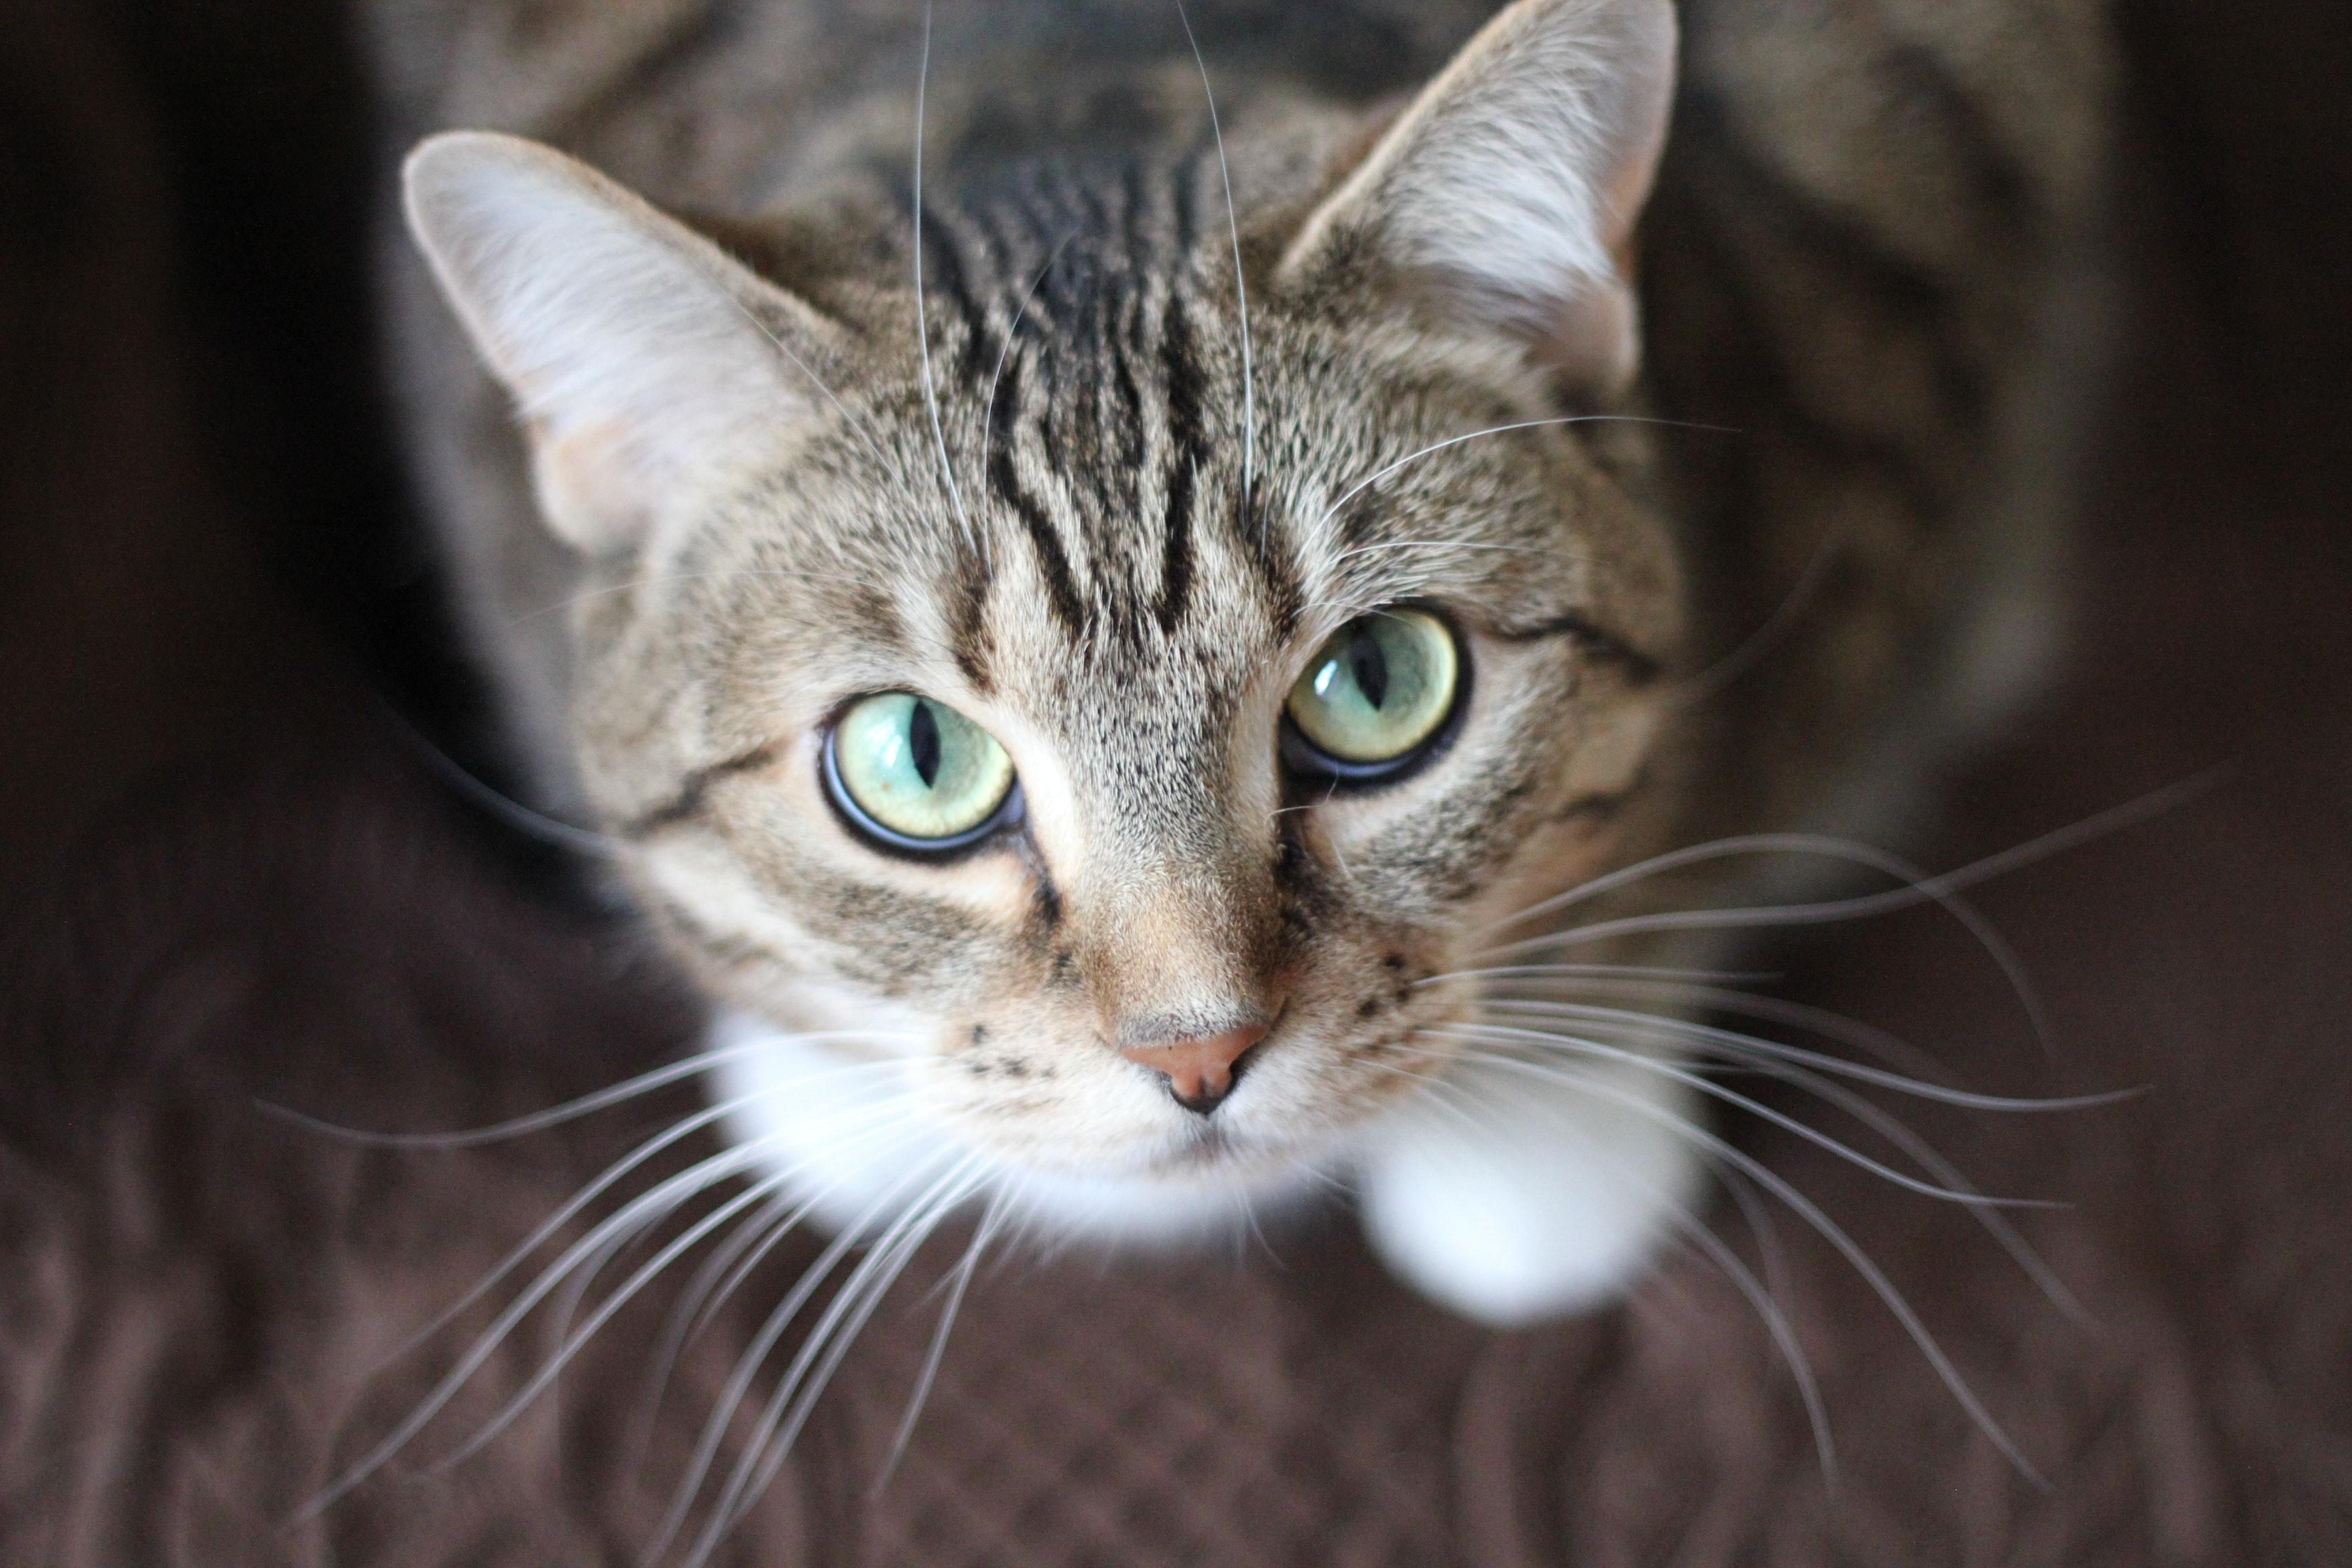 File:Adorable-animal-cat-20787.jpg - Wikipedia